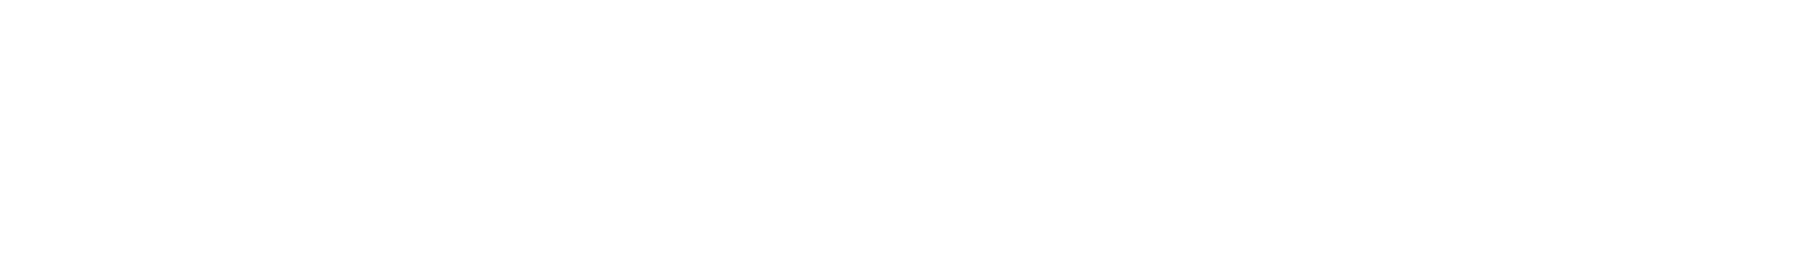 bellarp